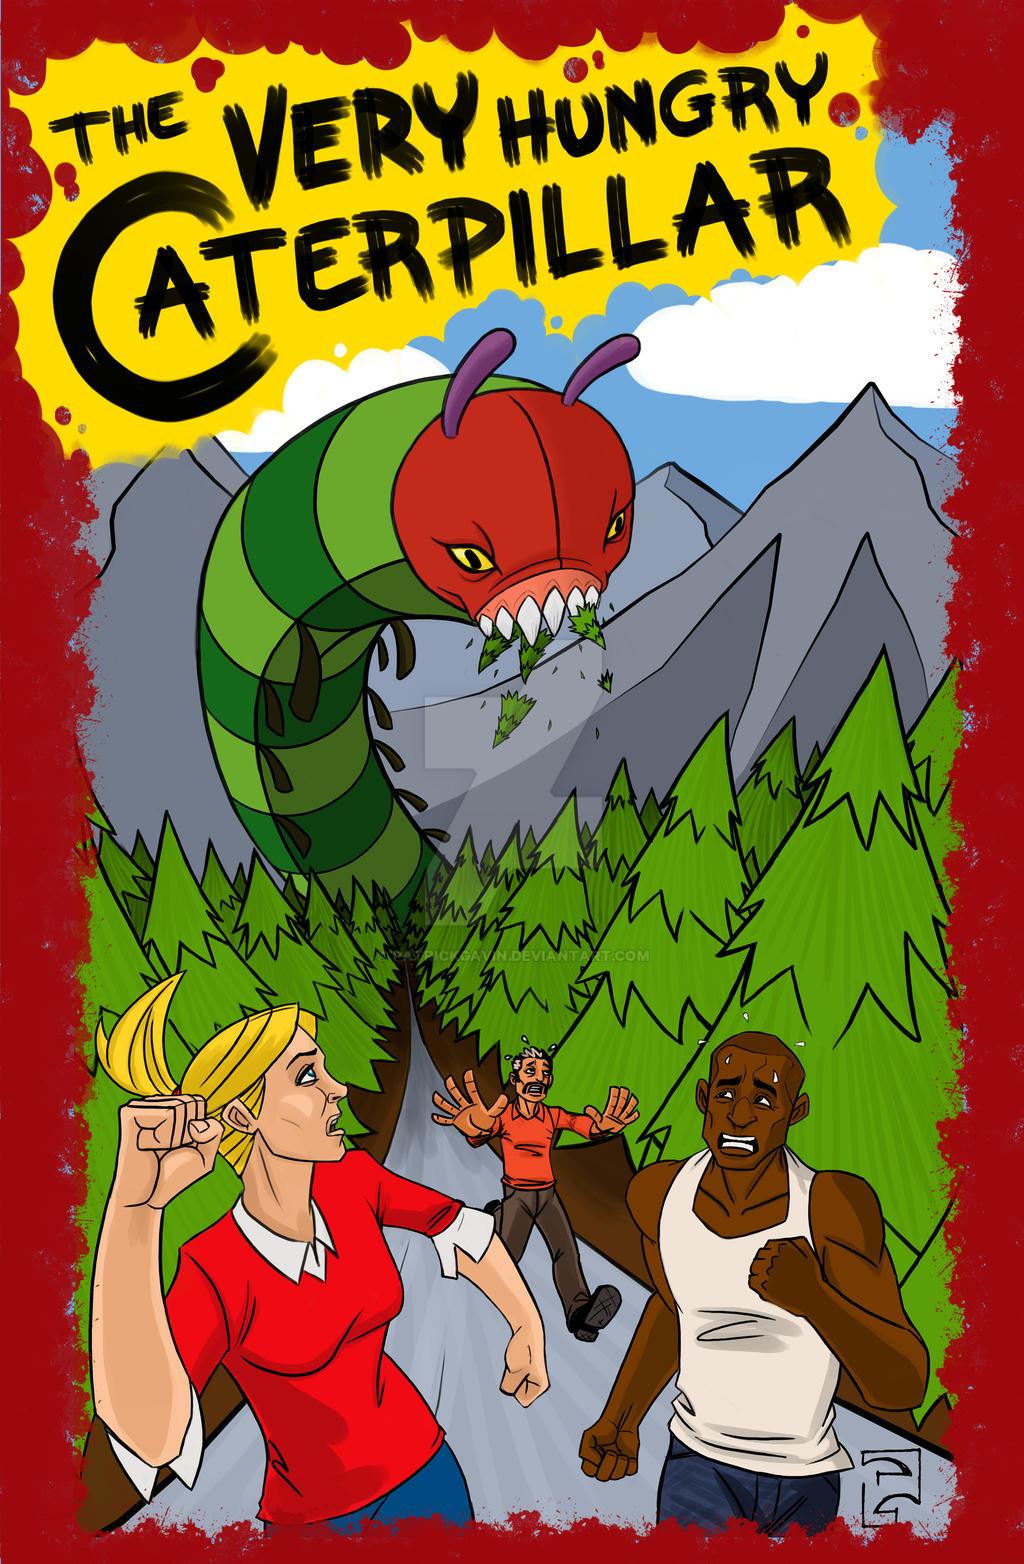 VERY Hungry Caterpillar B-Movie Poster by PatrickGavin